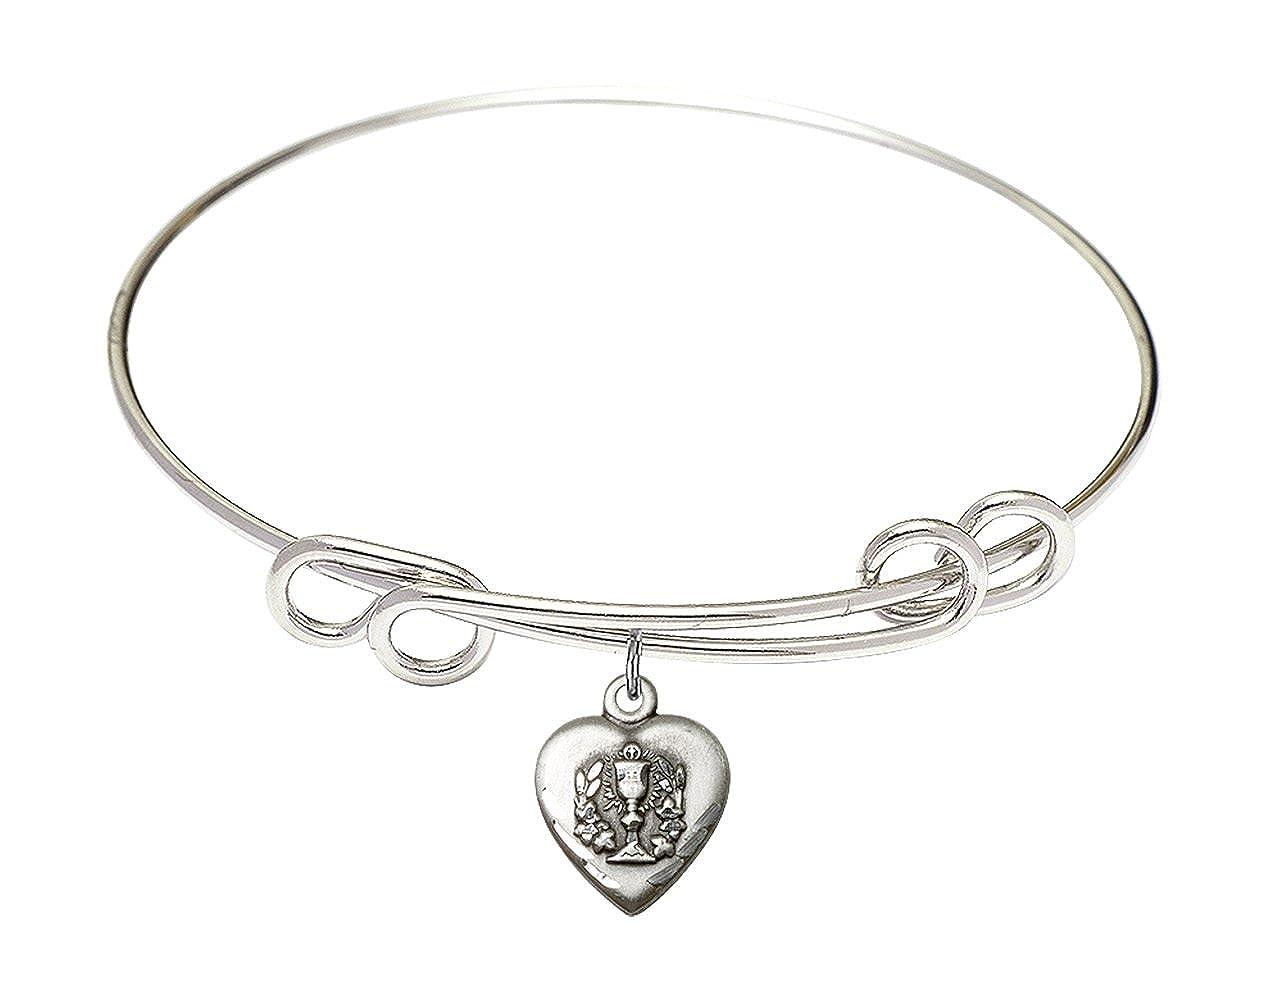 DiamondJewelryNY Double Loop Bangle Bracelet with a Holy Communion Charm.